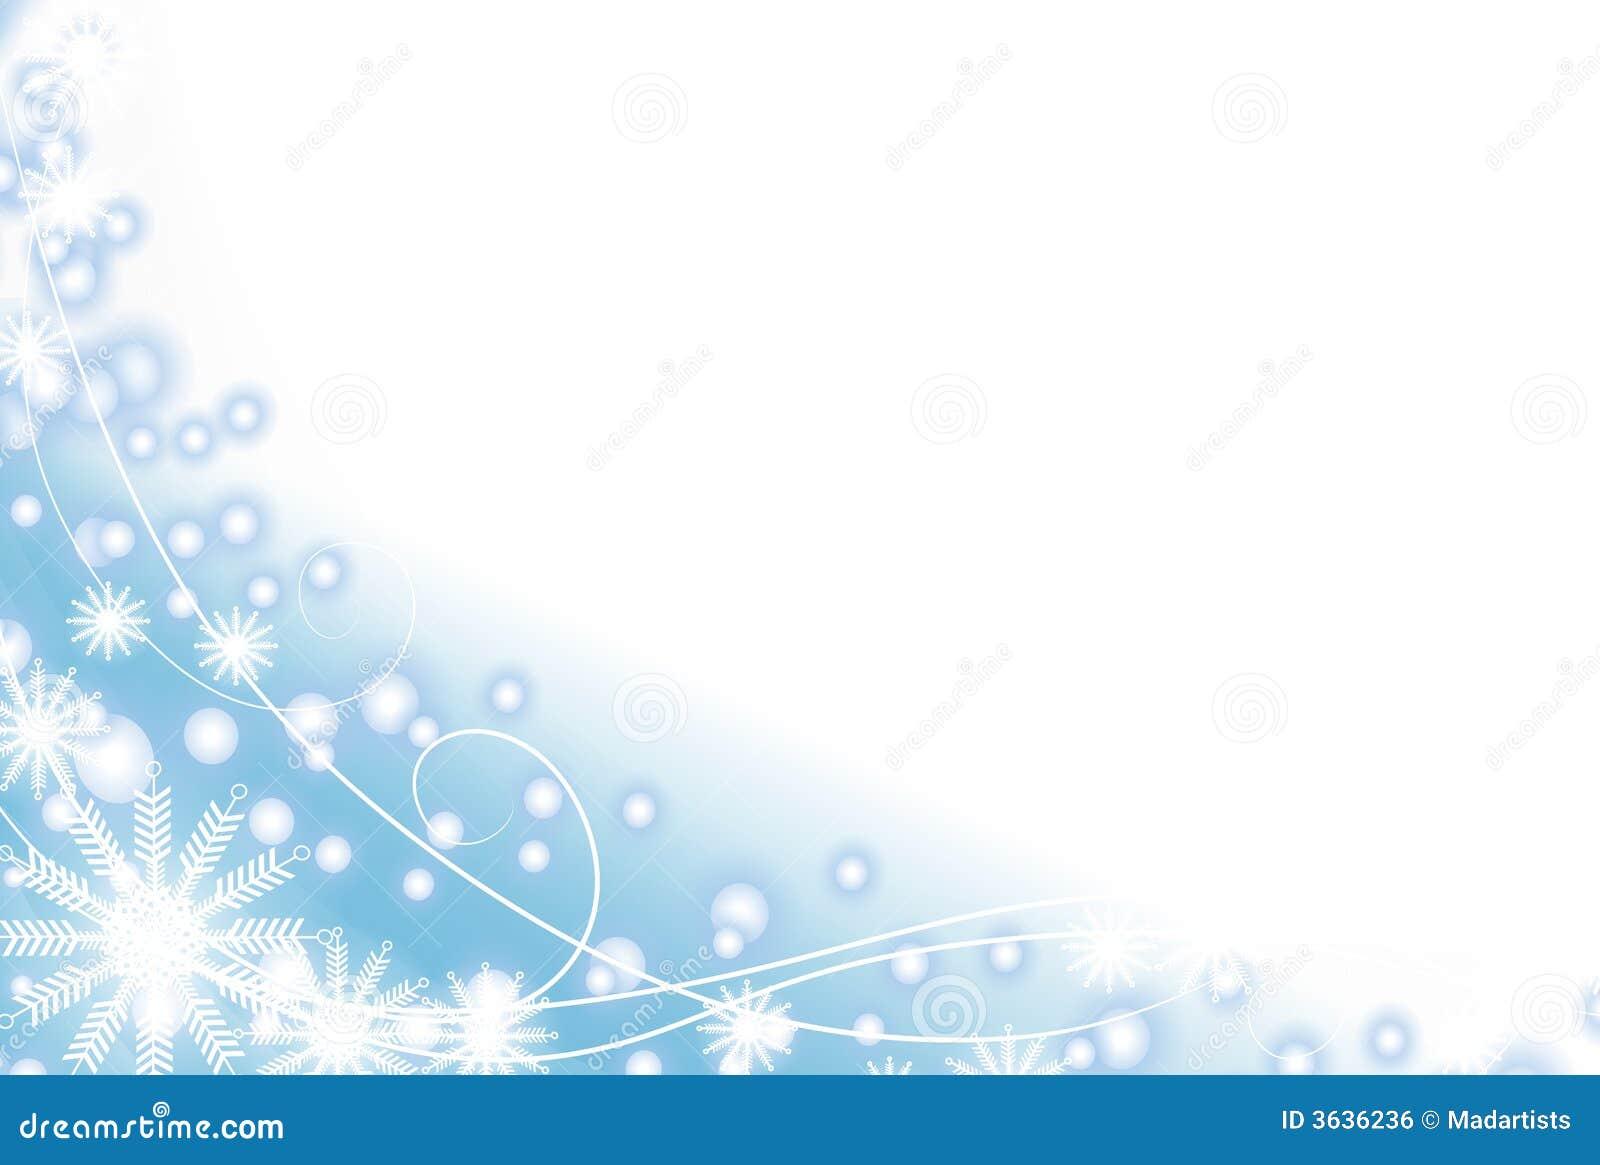 Snowflake and Light Blue Snow